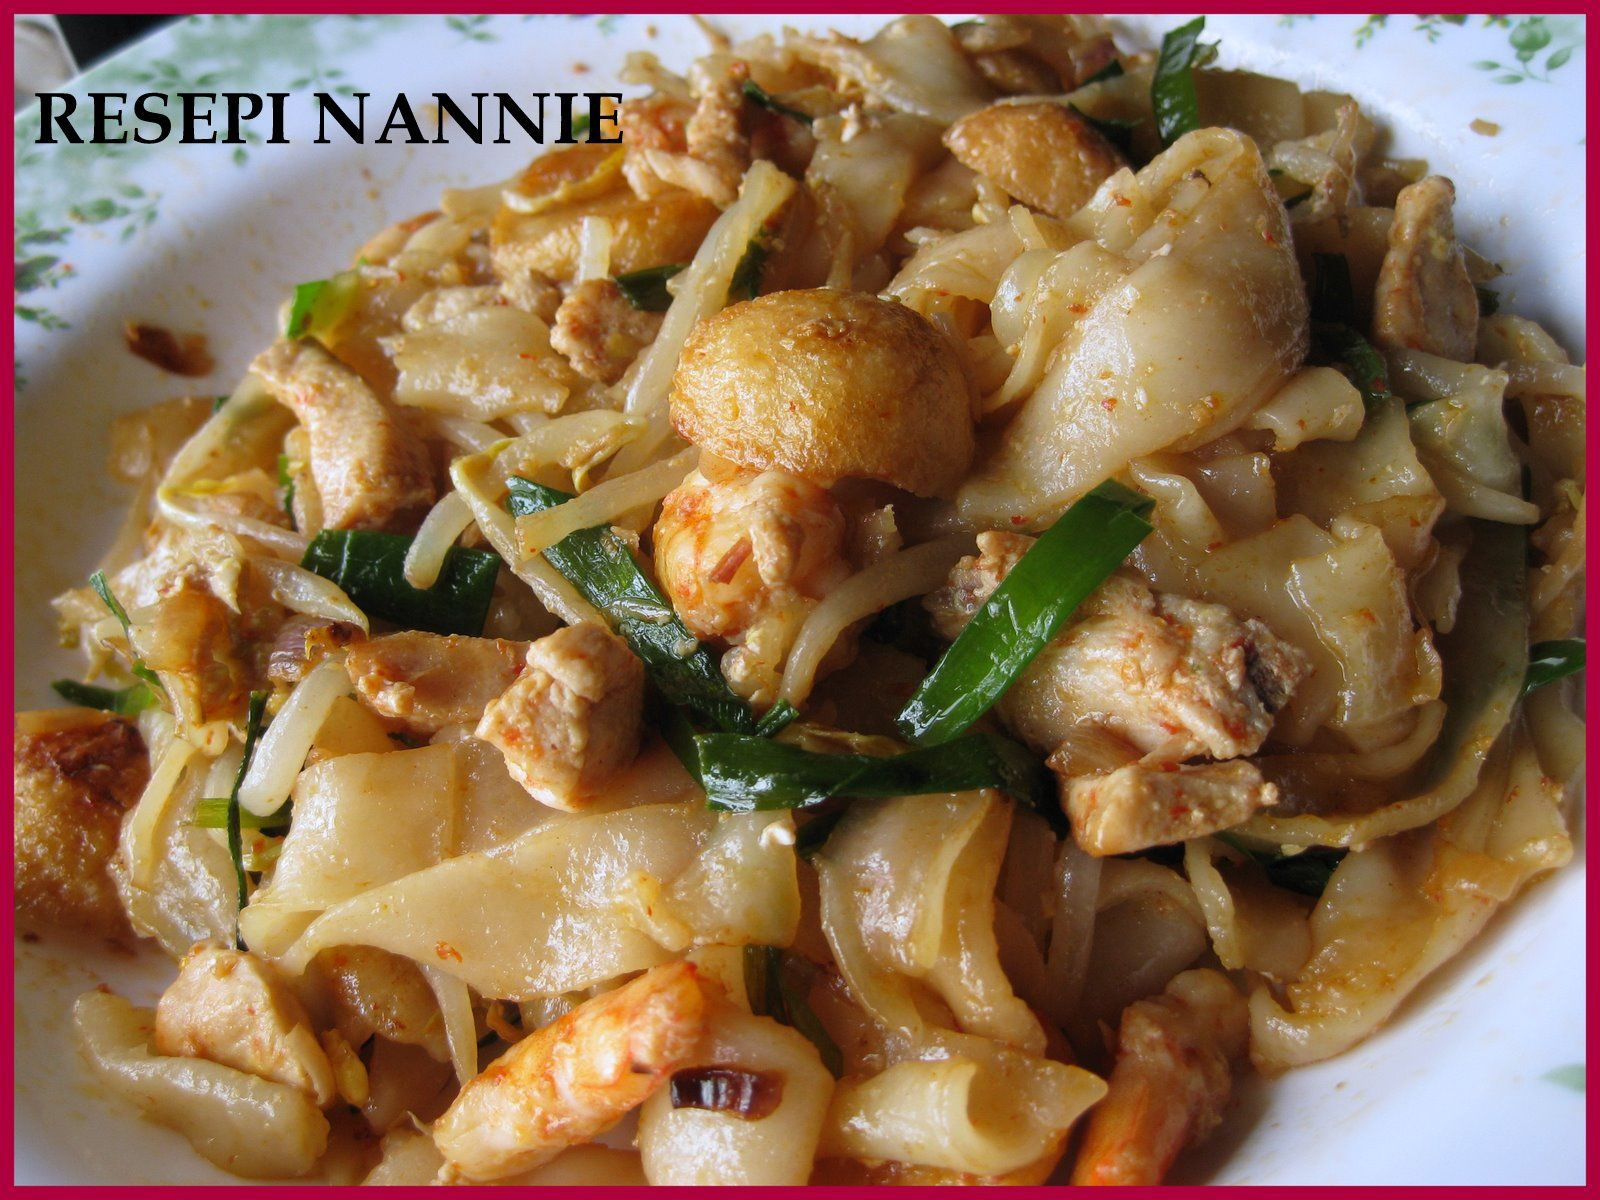 Resepi Nannie Kueyteow Goreng Tak Pedas Asian Recipes